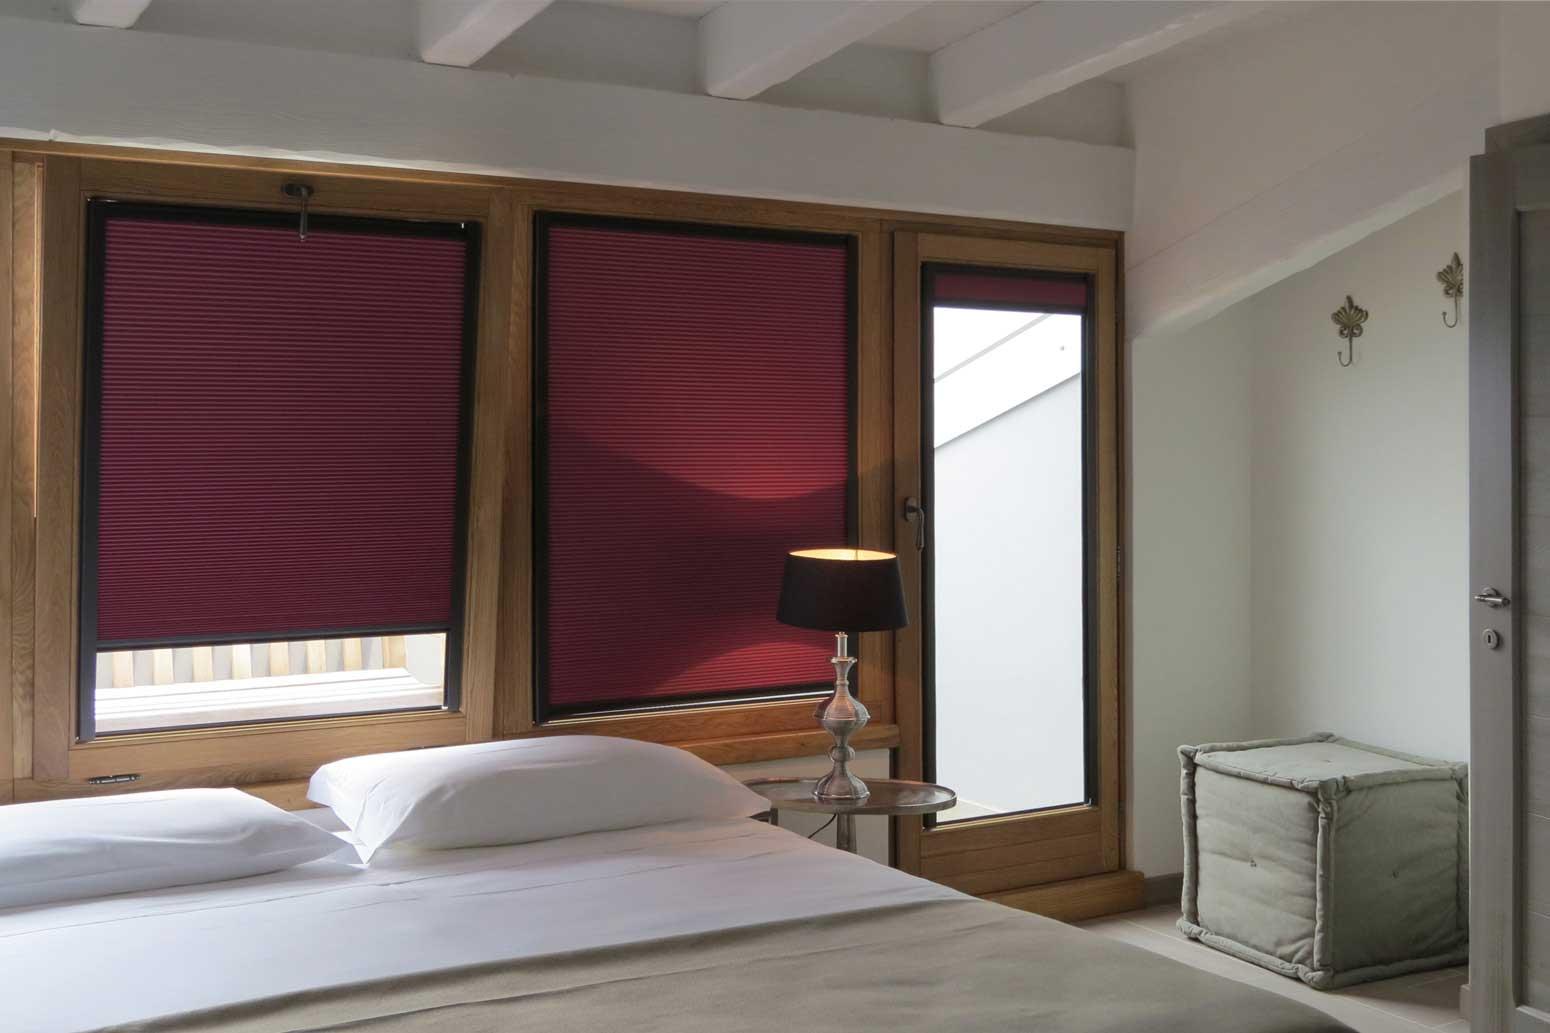 room-economy-orizz-1-min